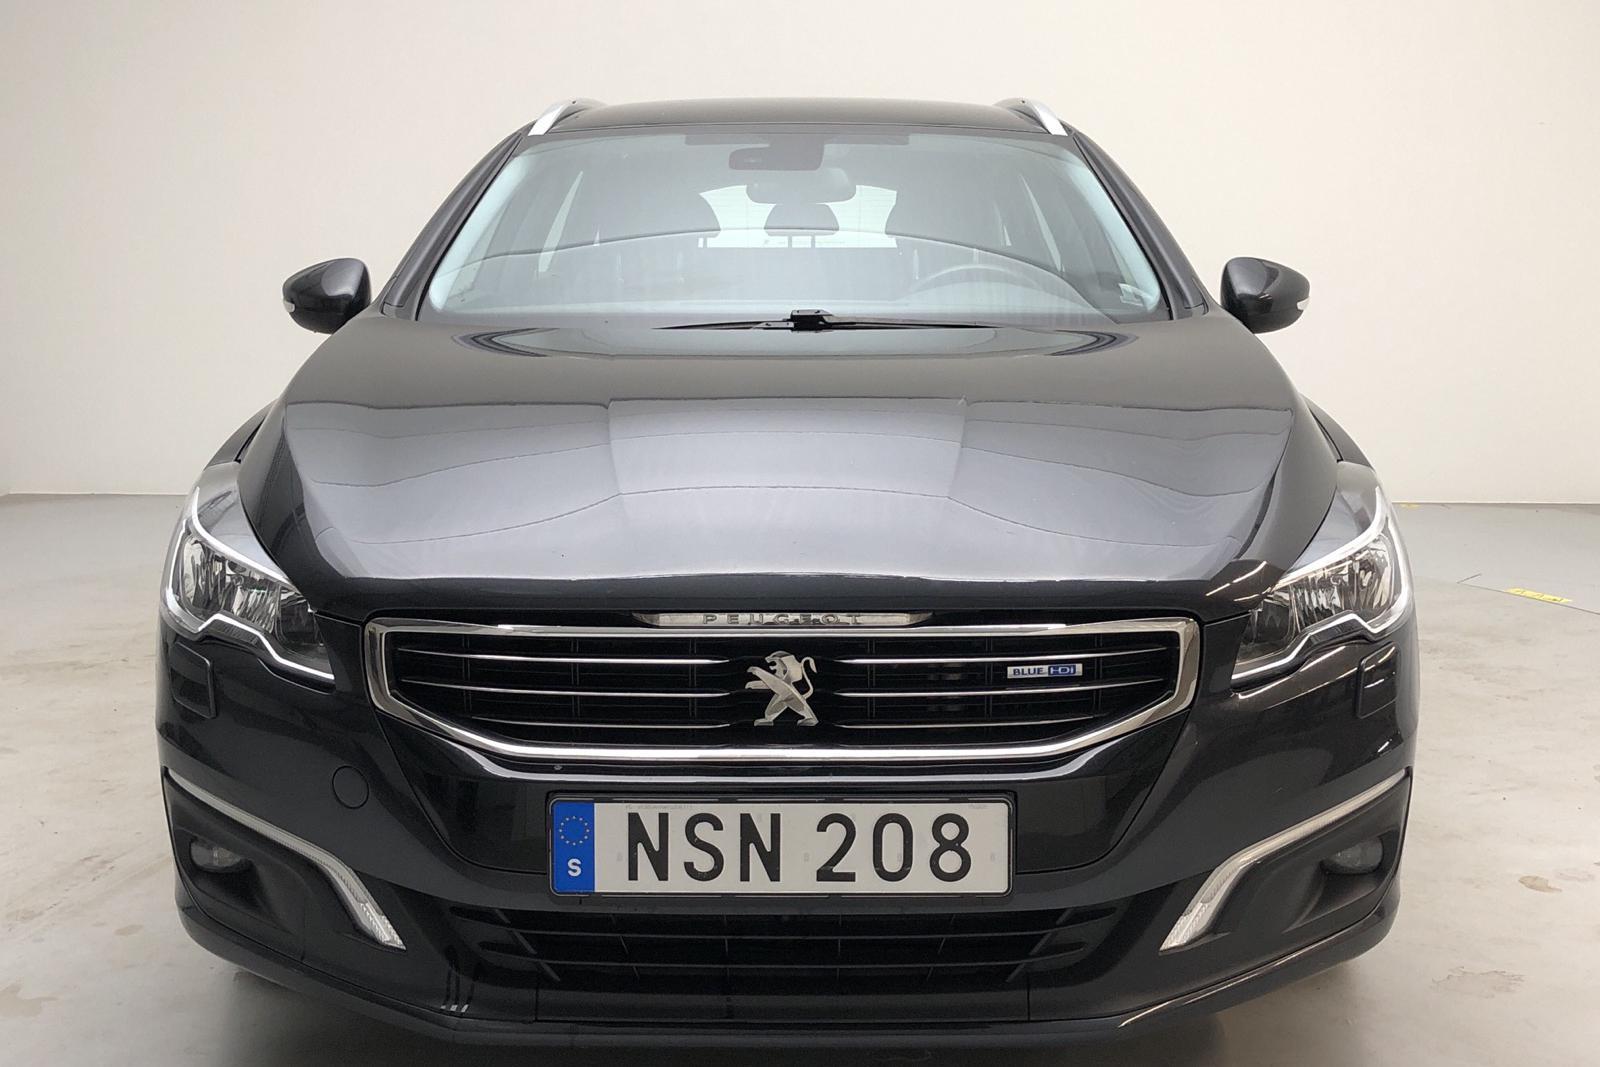 Peugeot 508 SW BlueHDi (150hk) - 85 000 km - Manual - gray - 2015